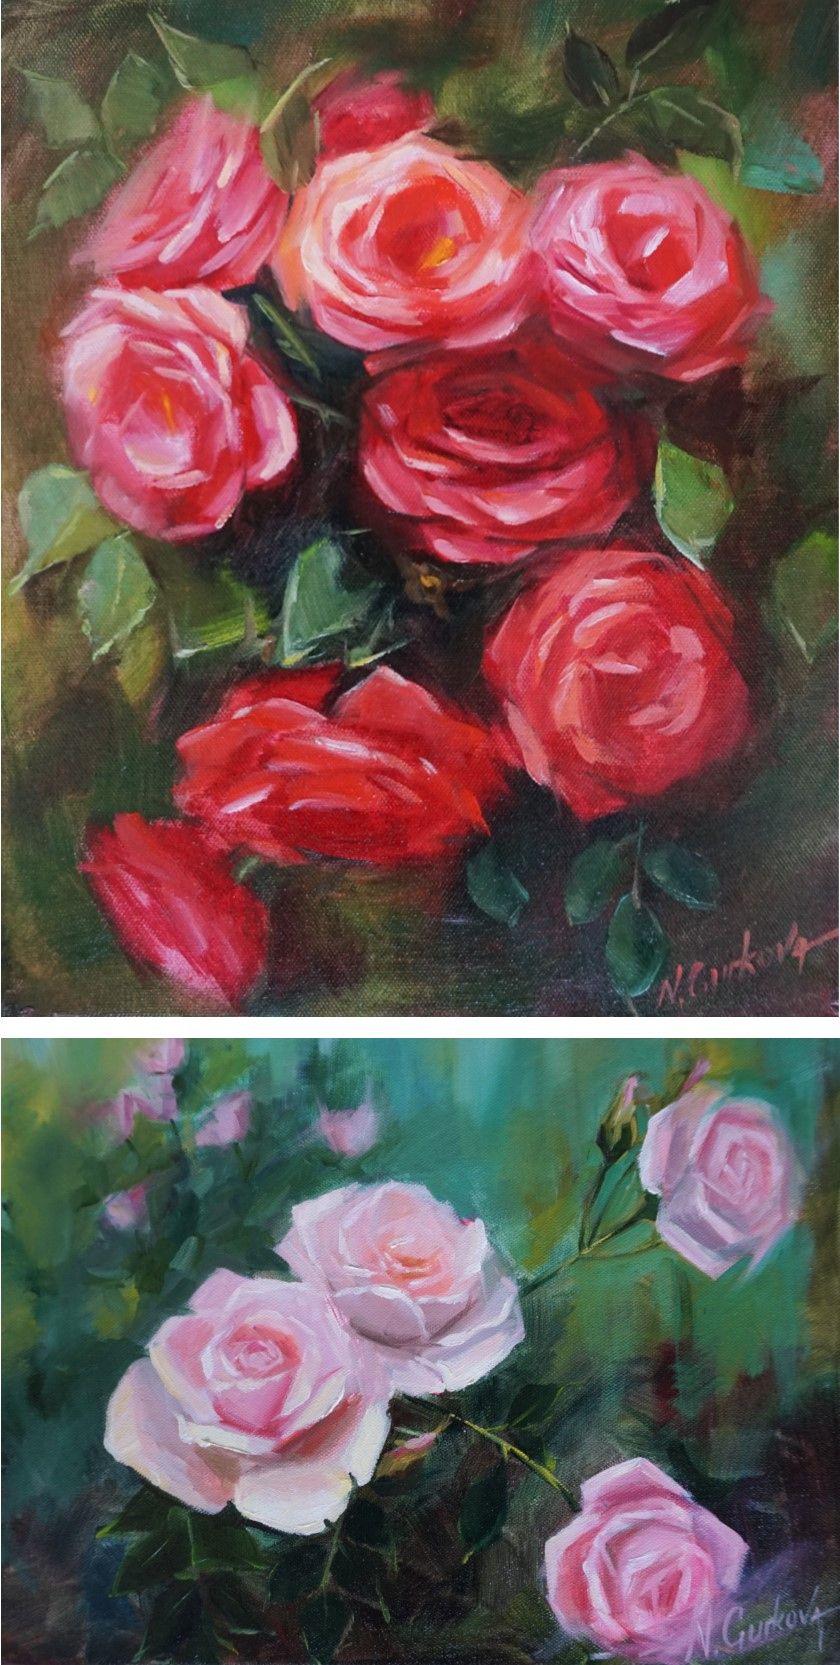 Pink Rose Flower Print Garden Floral Wall Art Decor For Kitchen Living Room In 2020 Floral Paintings Acrylic Flower Painting Flower Painting Original